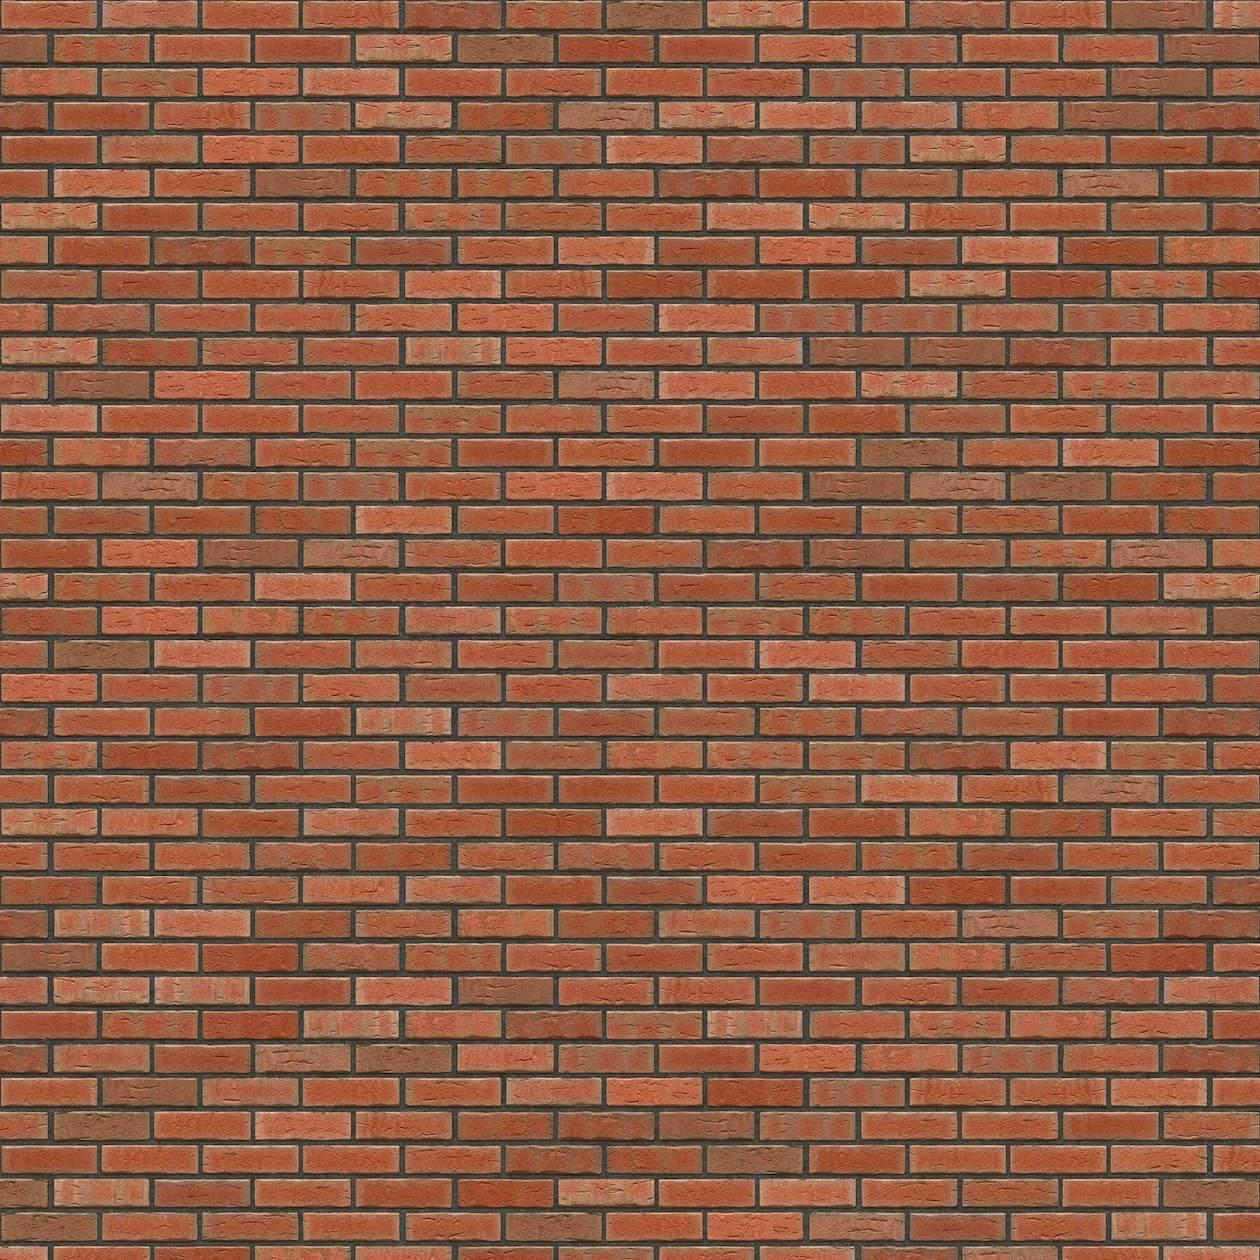 Puna-cigla-FeldHaus-Klinker-brick-house-nf-k-689-Antracit Fuga